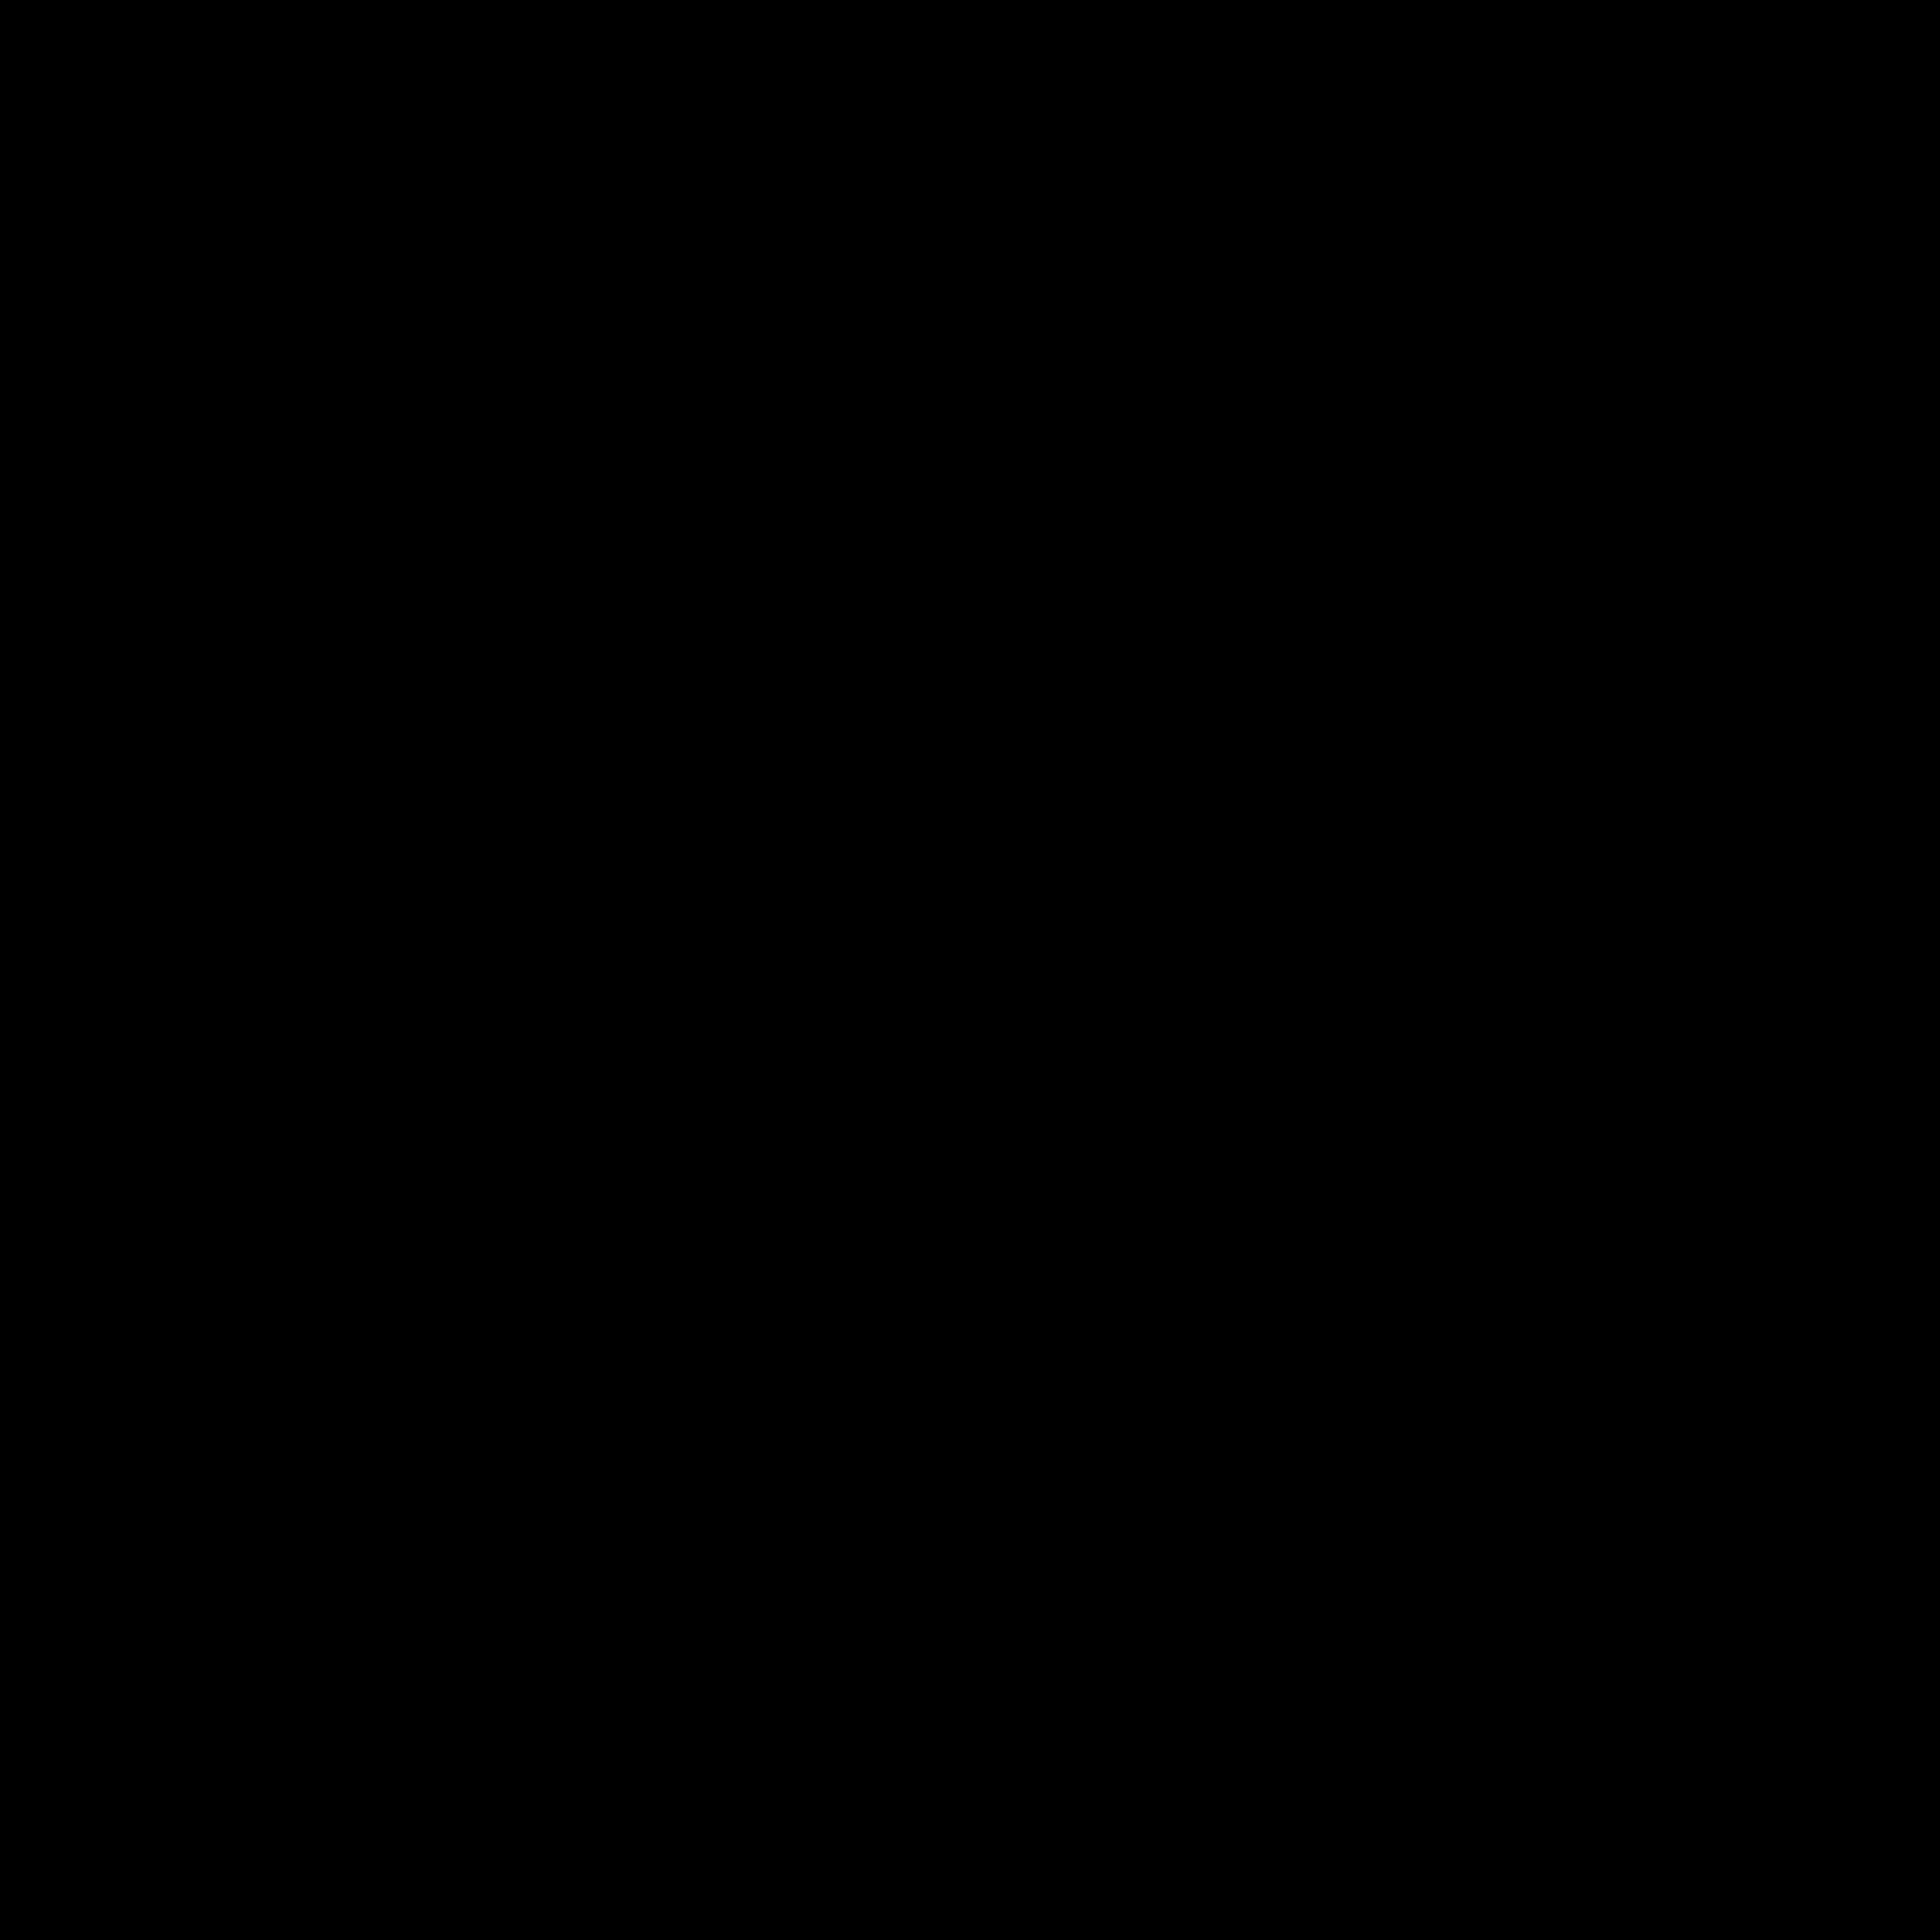 psychologysymbol.png.